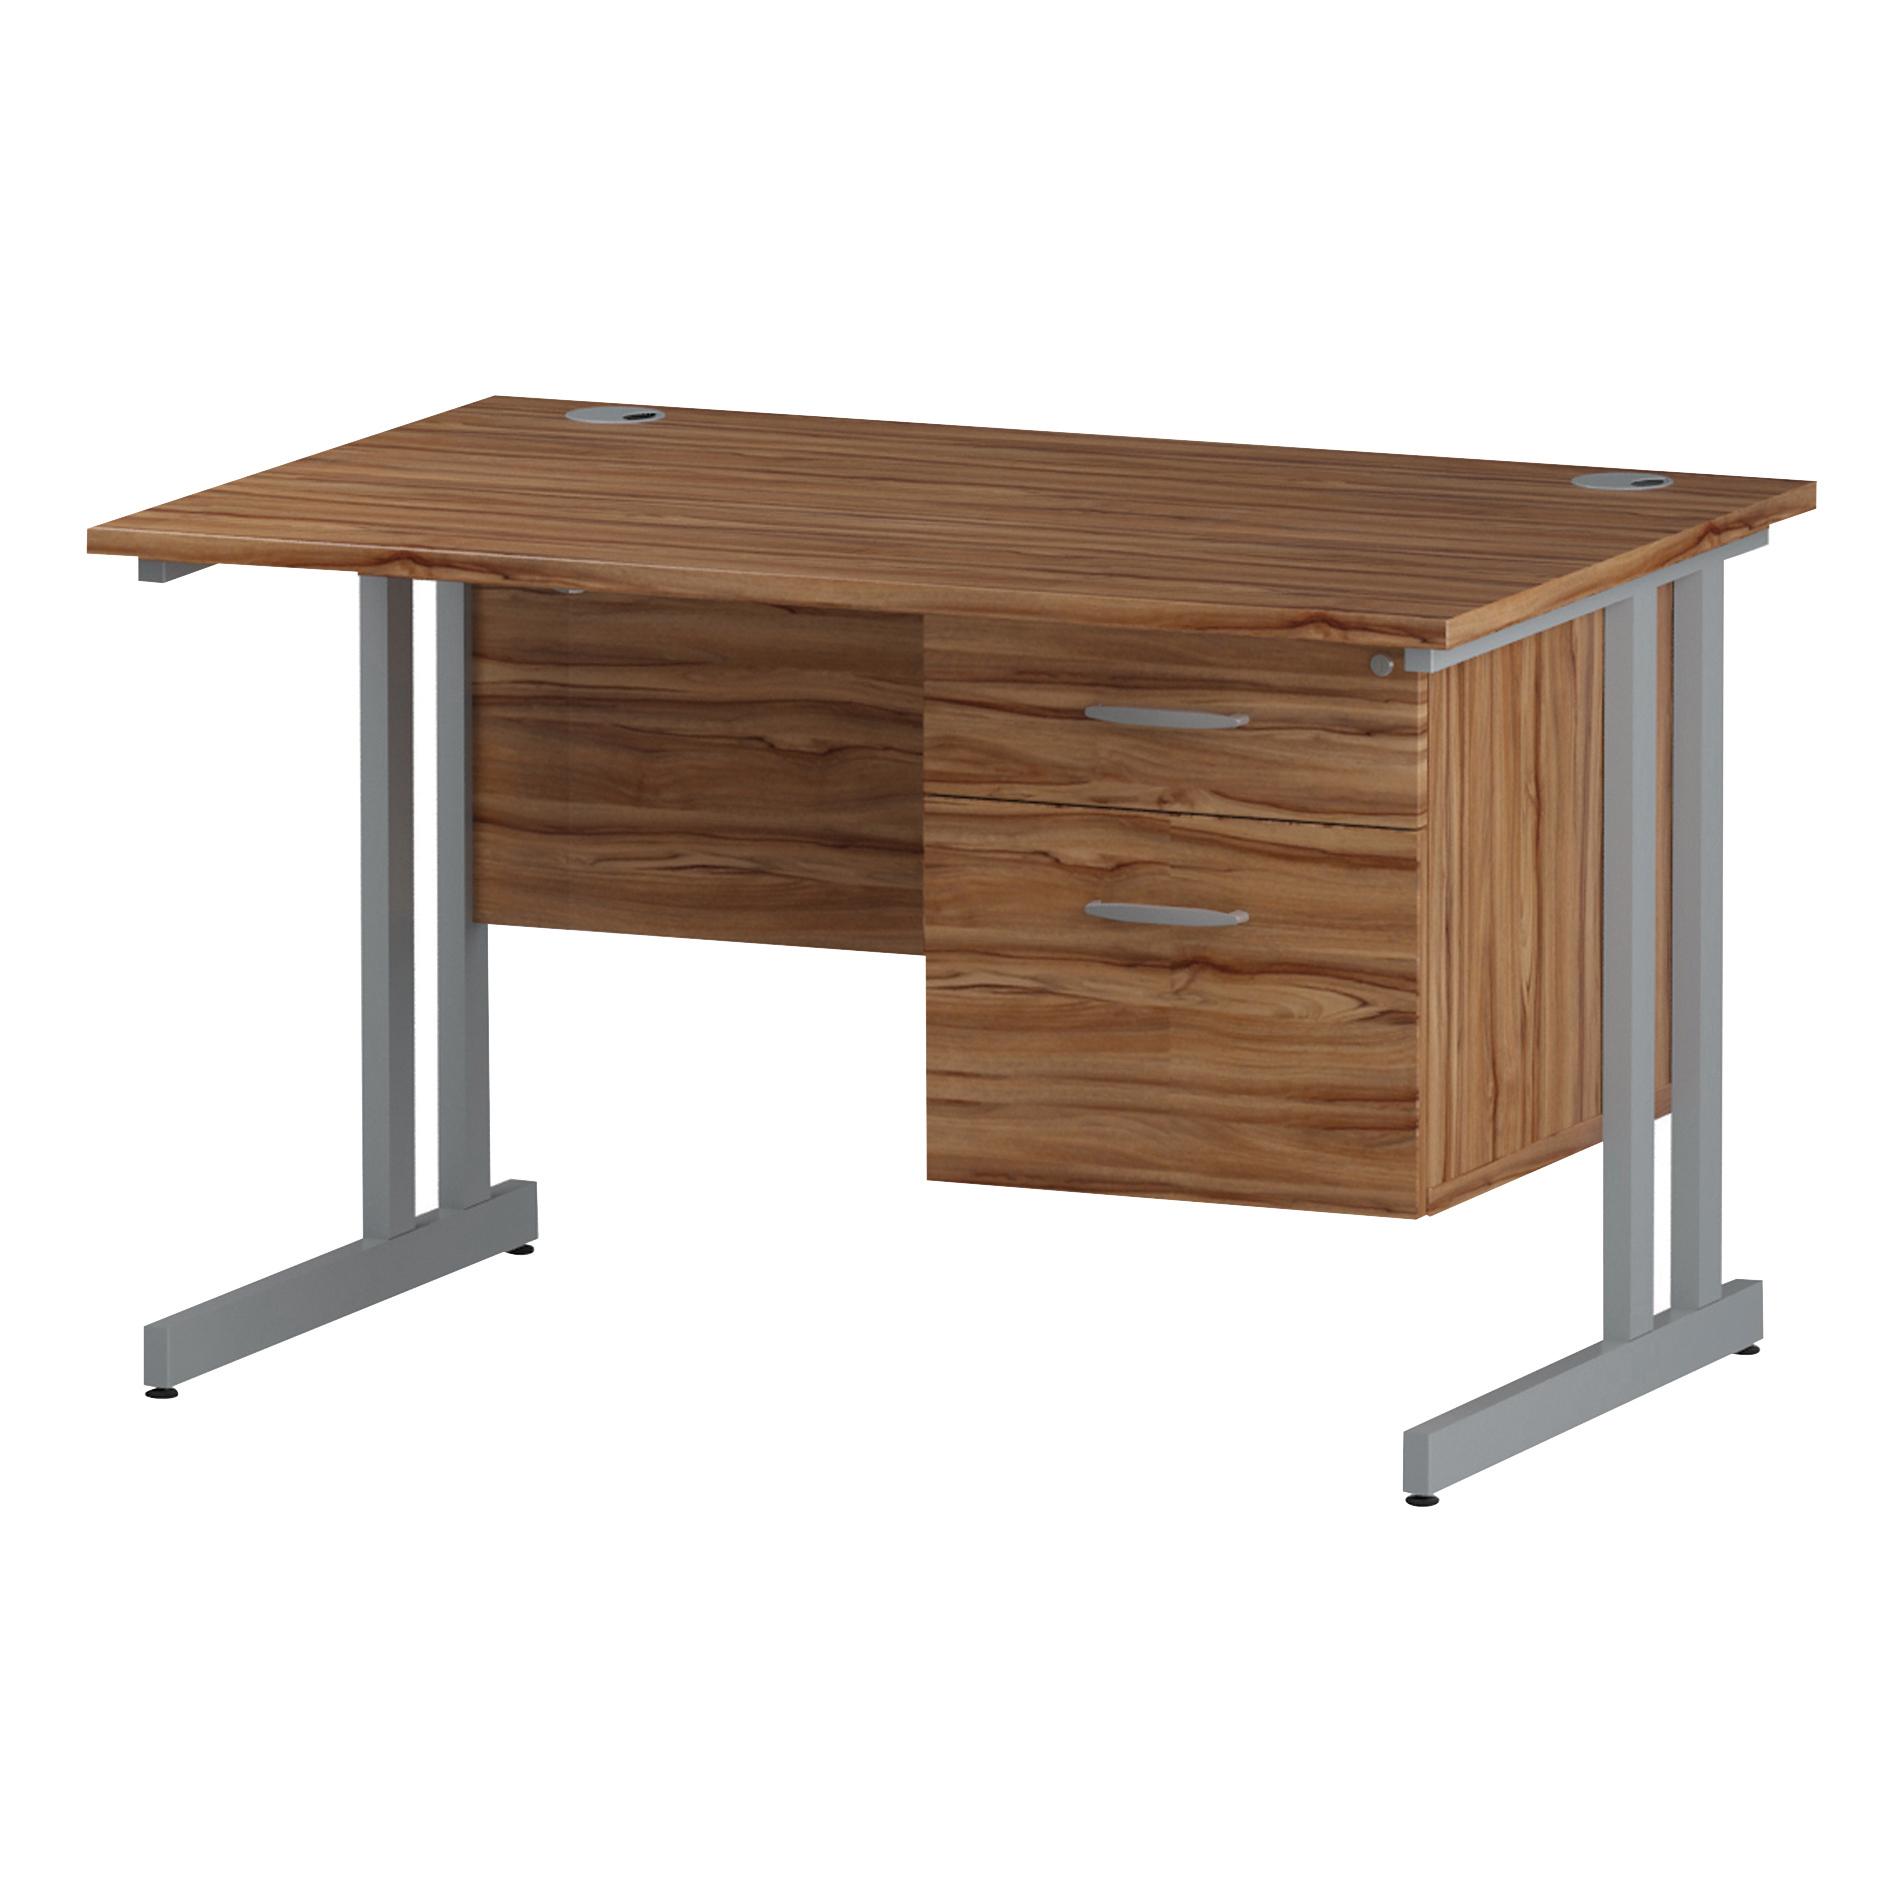 Trexus Rectangular Desk Silver Cantilever Leg 1200x800mm Fixed Pedestal 2 Drawers Walnut Ref I001919